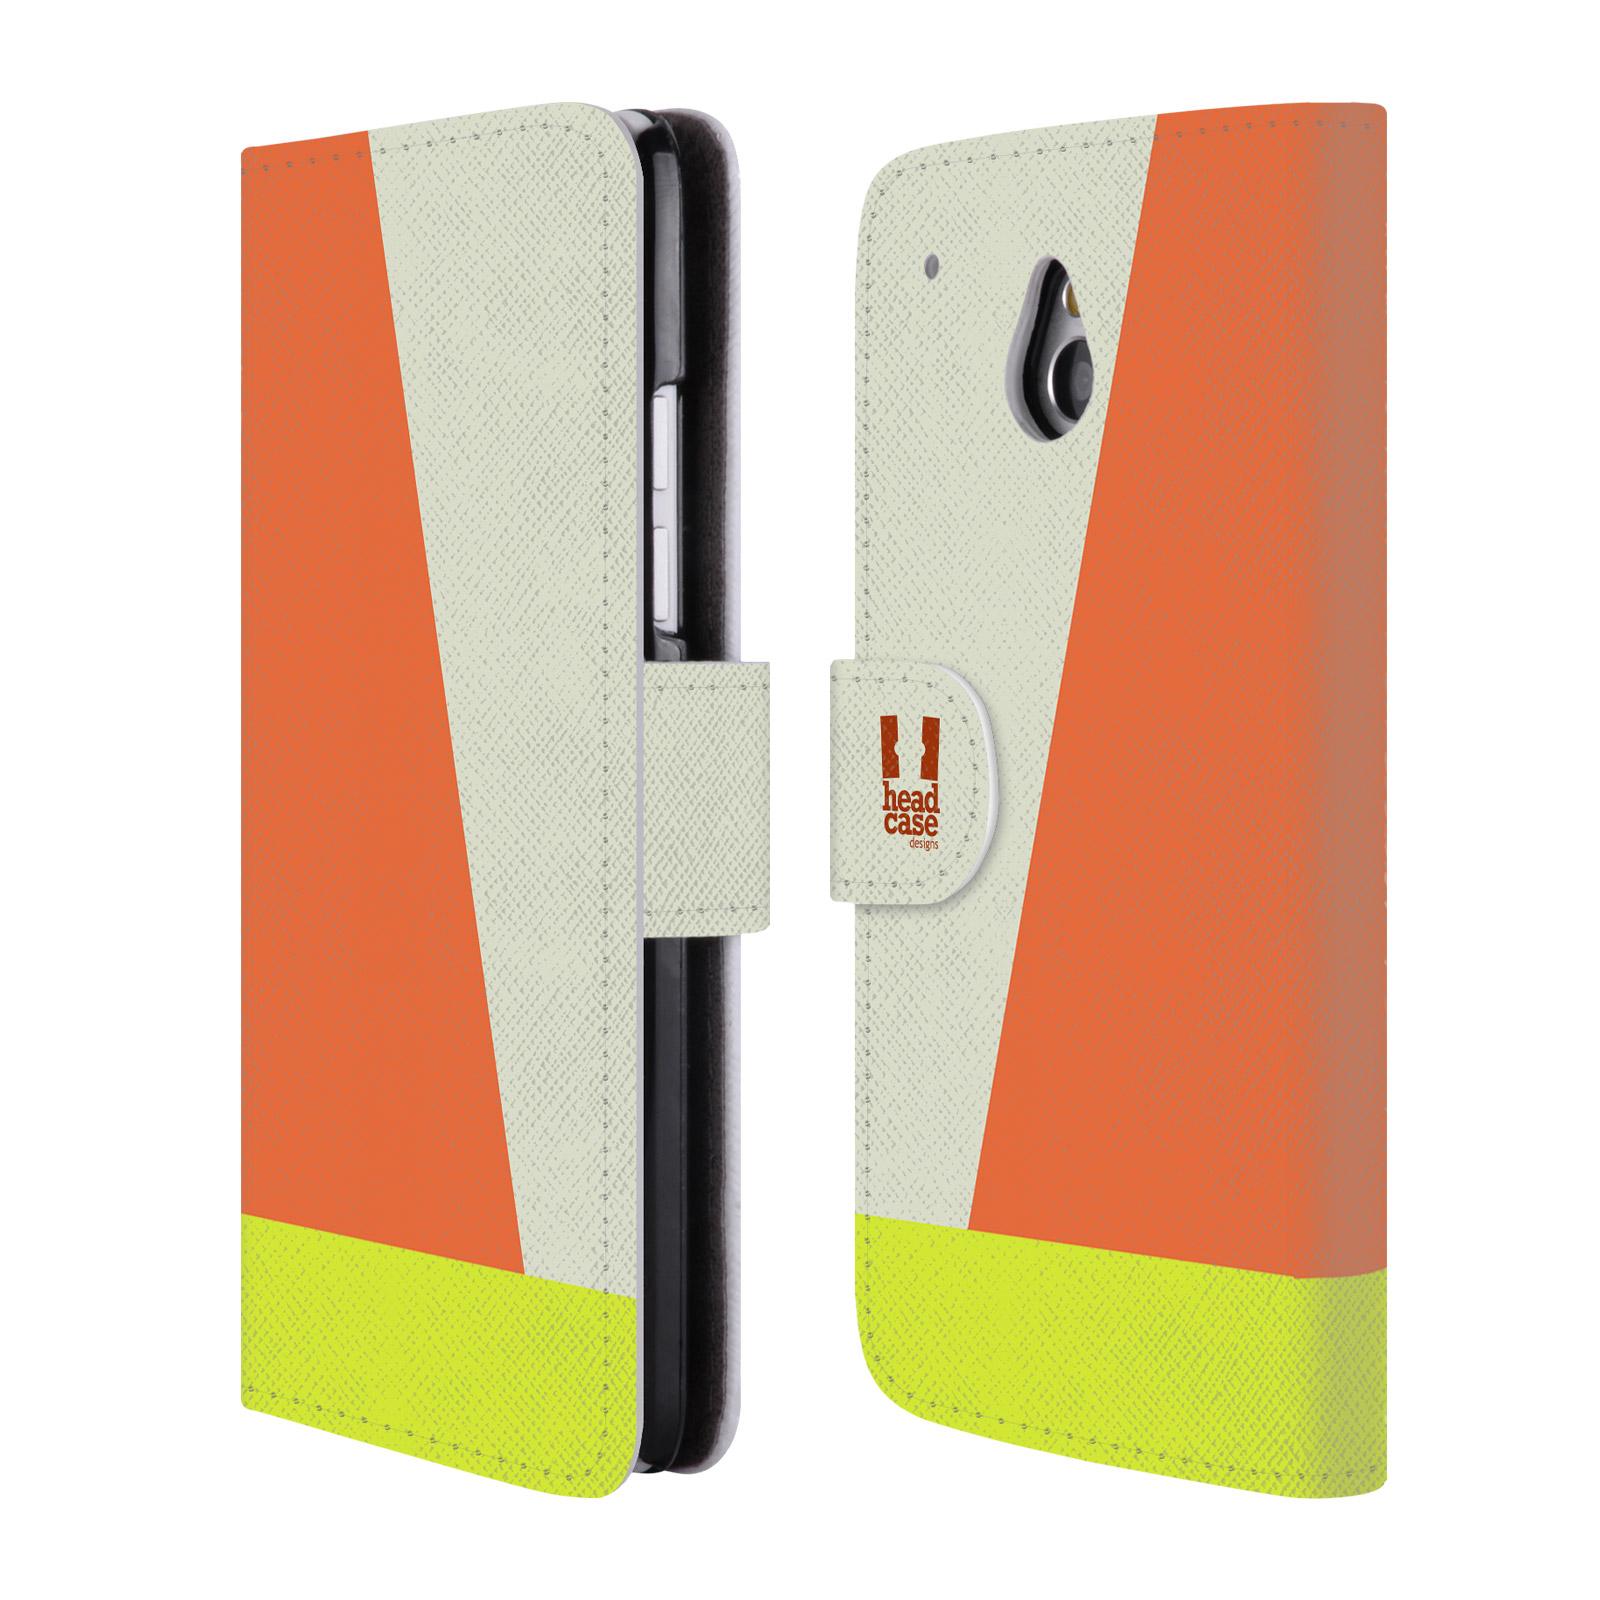 HEAD CASE Flipové pouzdro pro mobil HTC ONE MINI barevné tvary slonová kost